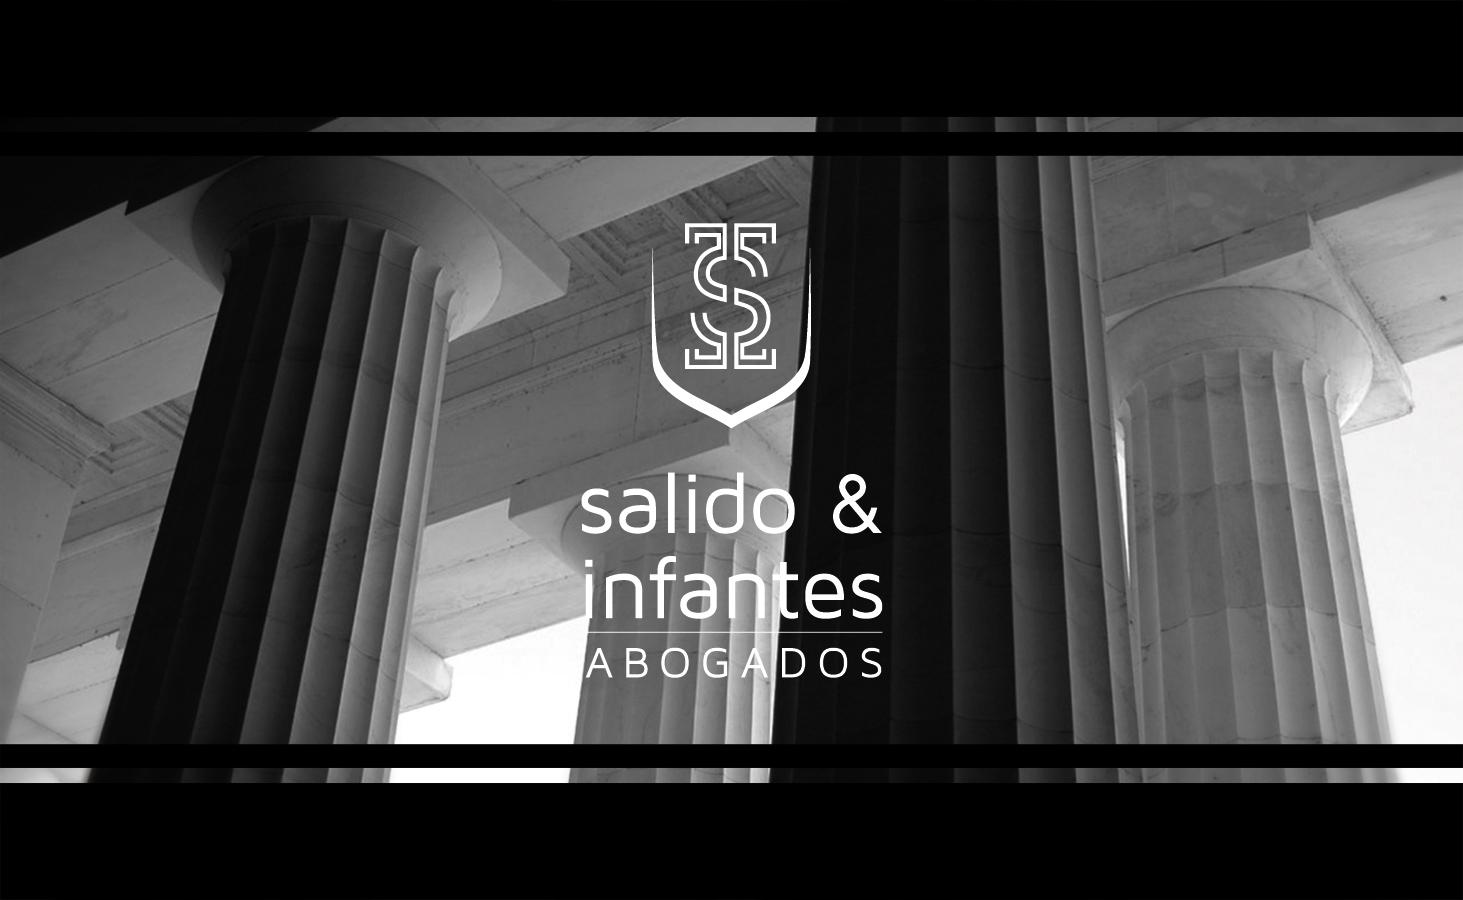 Salido_infantes02